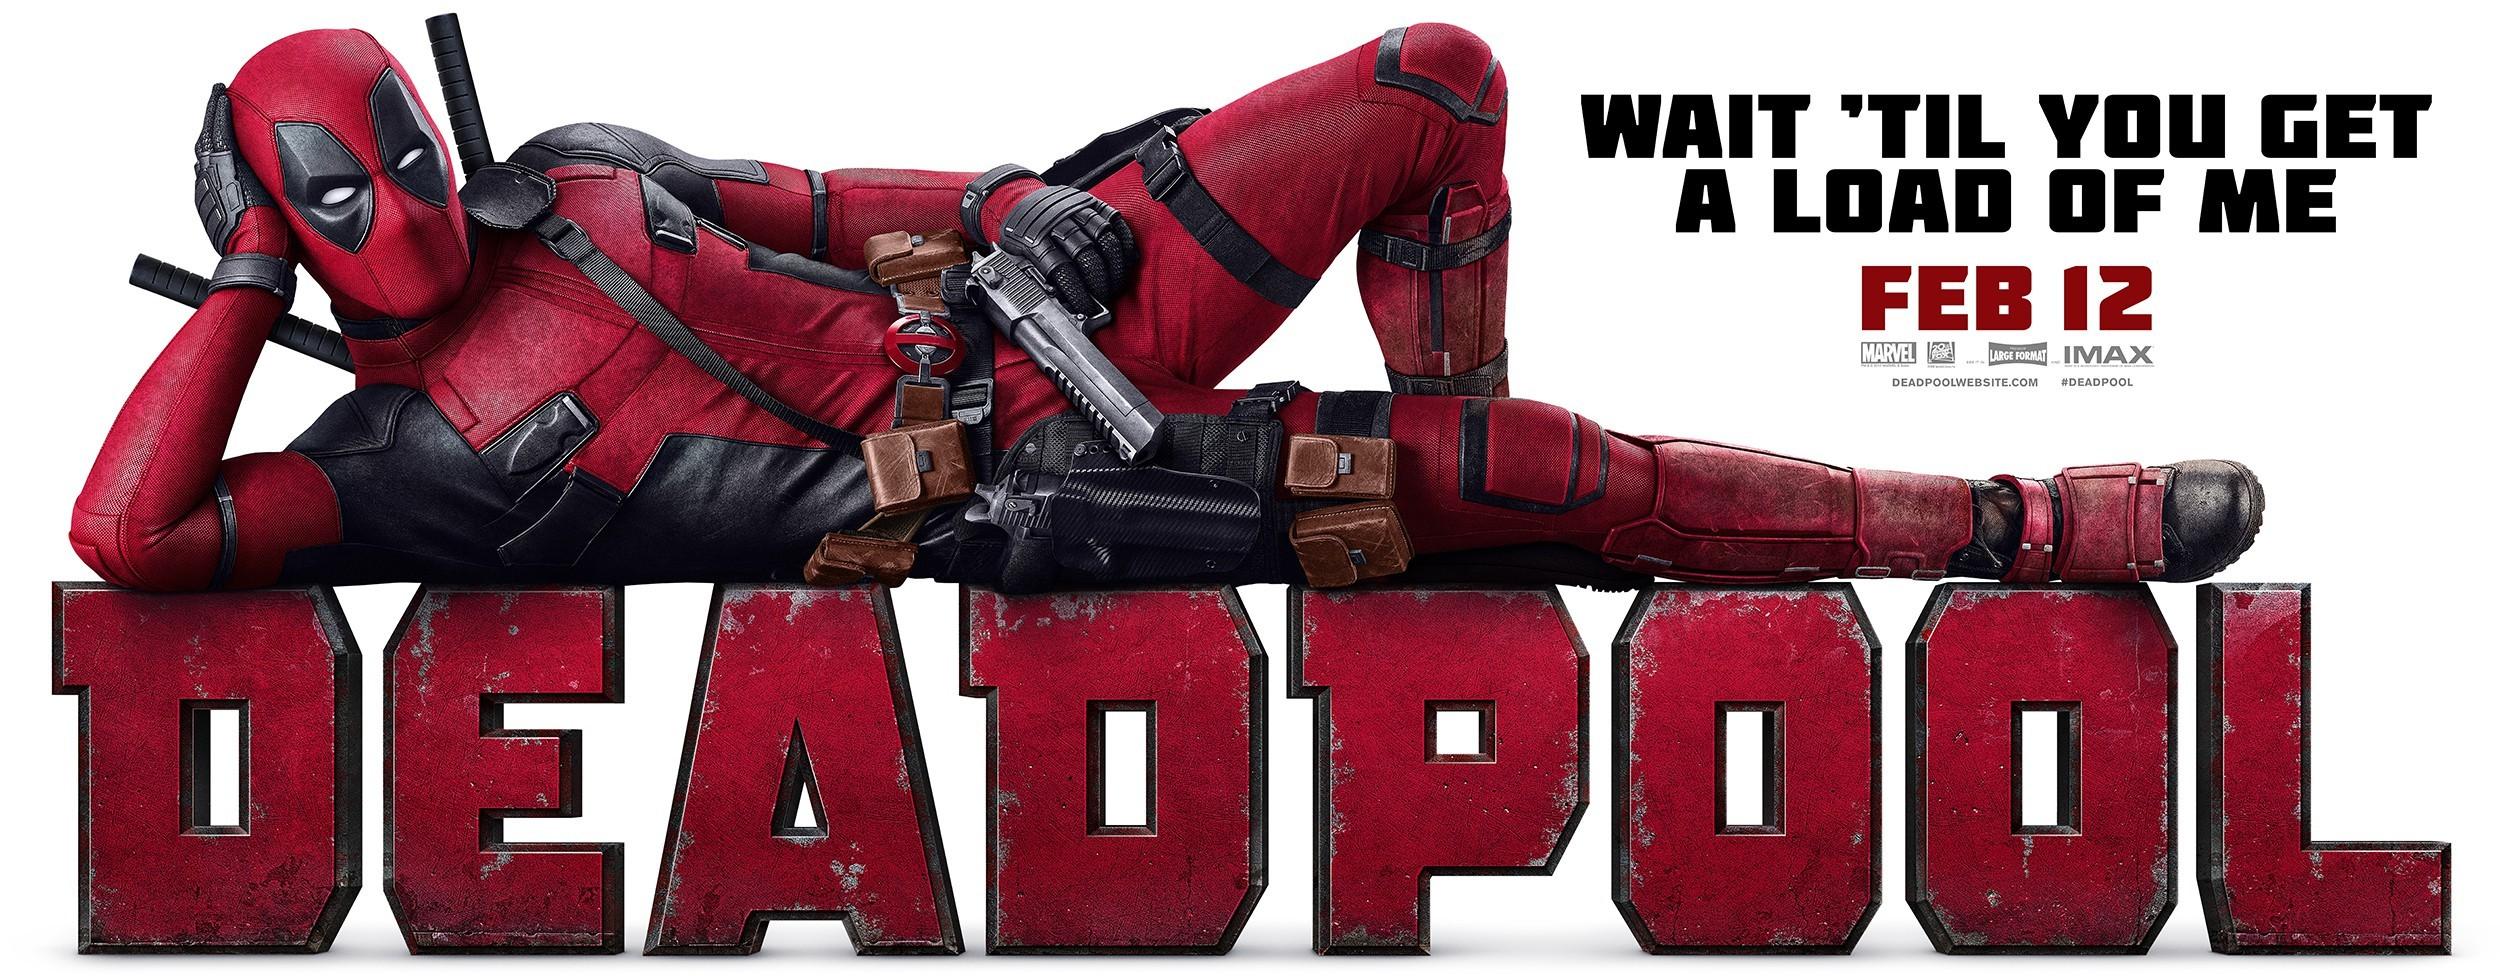 deadpool_14.jpg